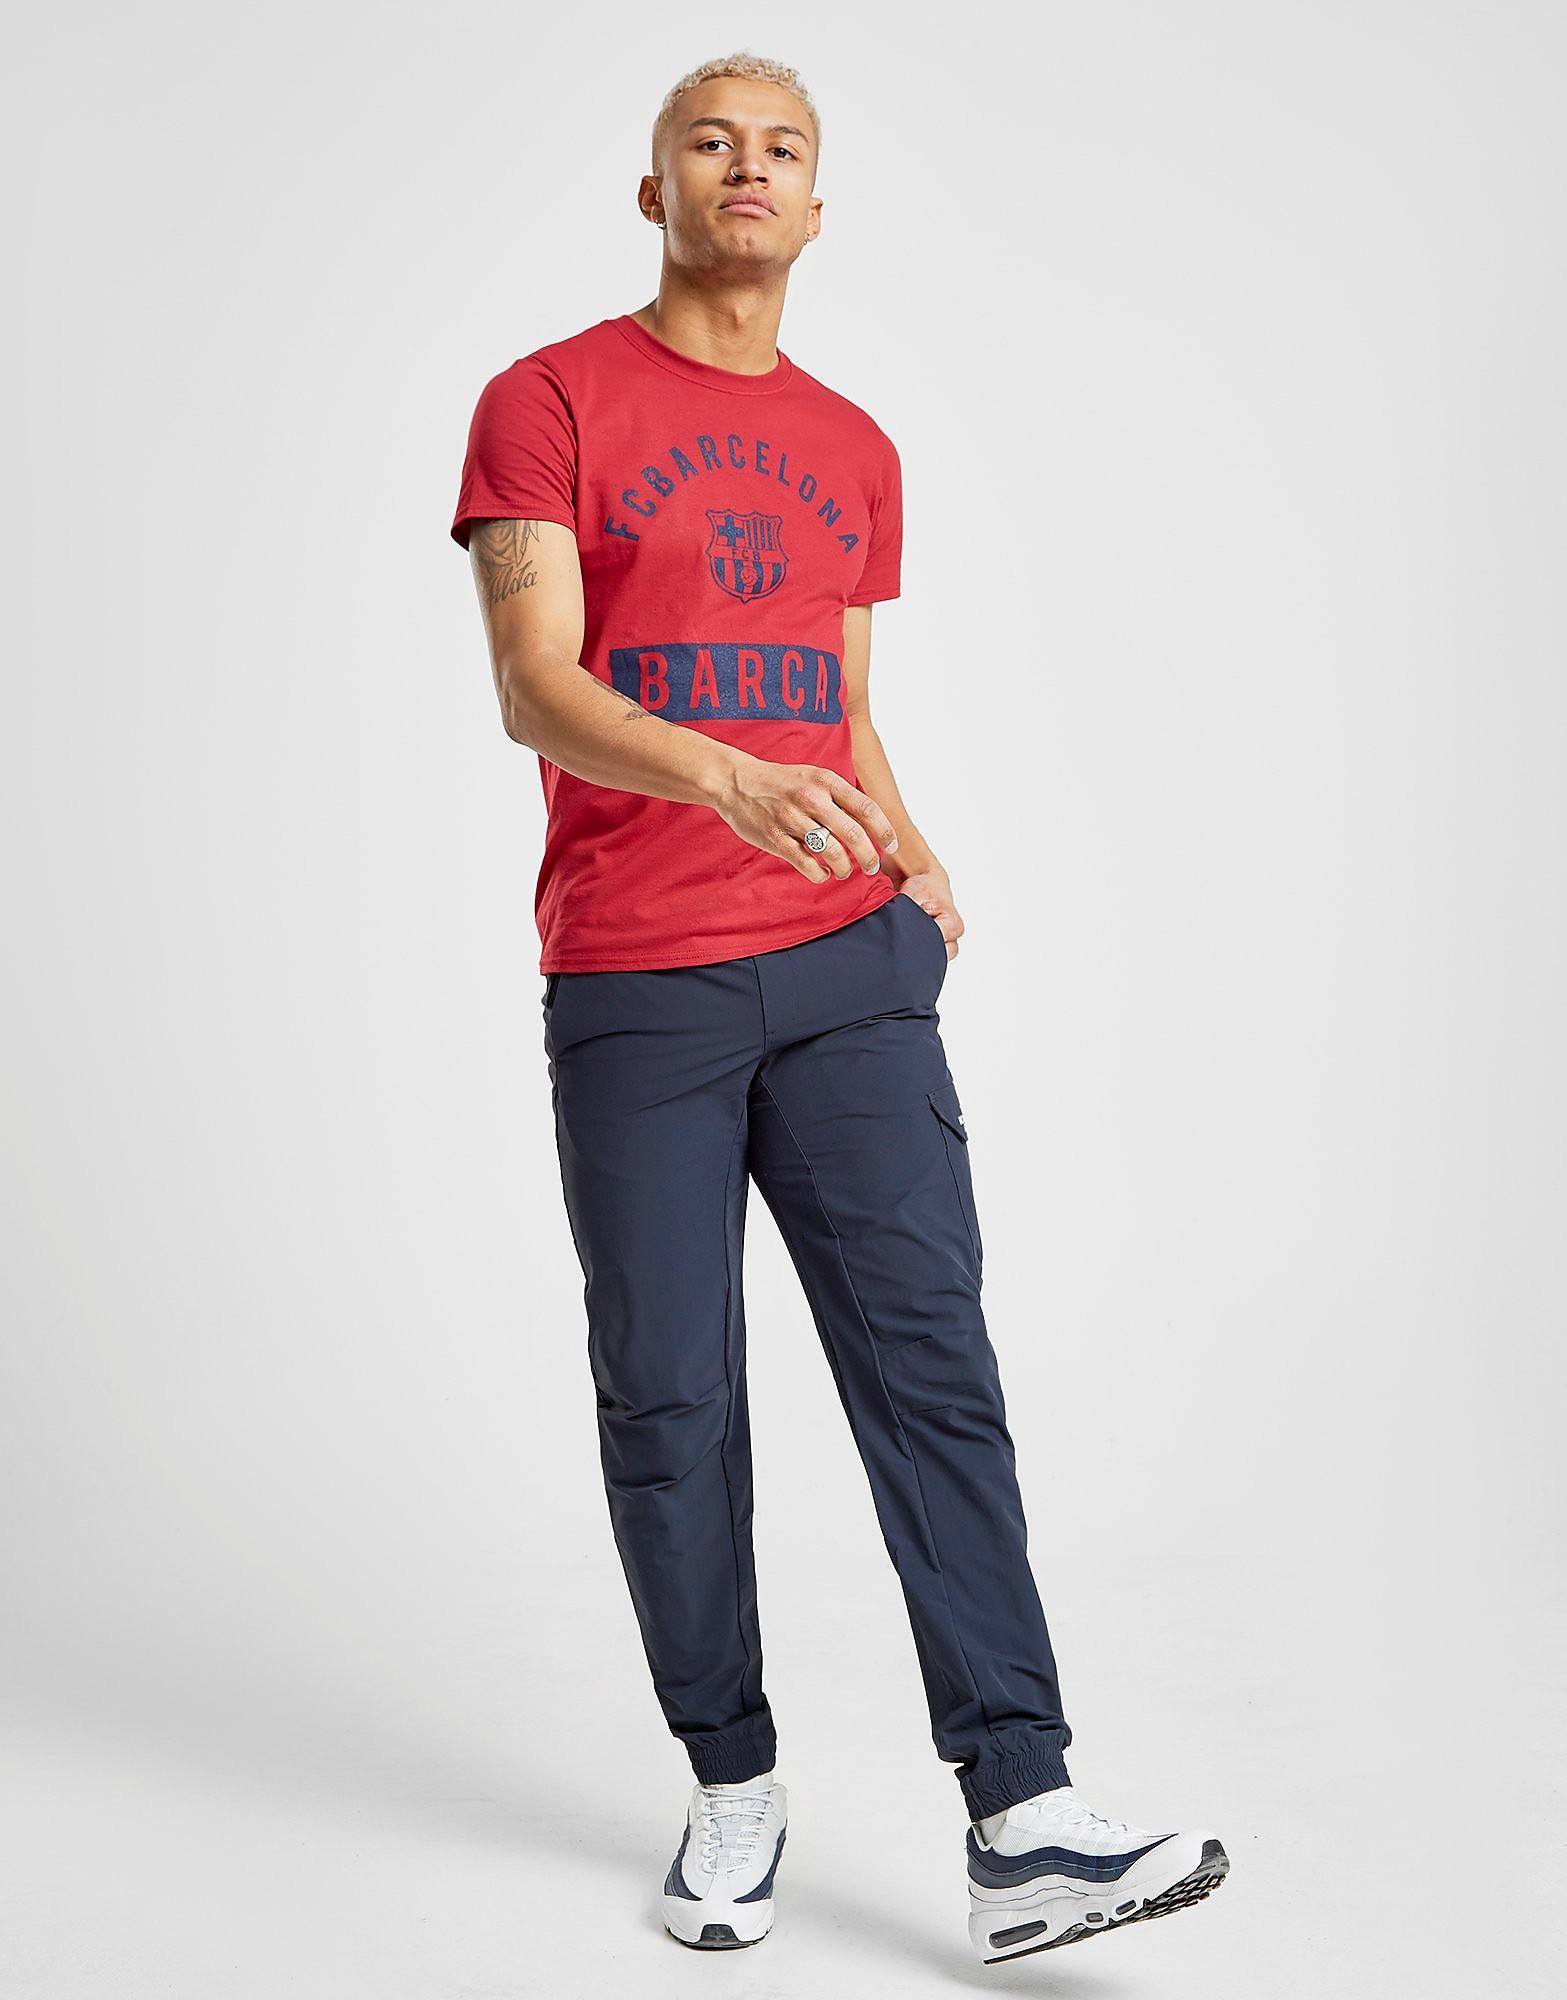 Official Team FC Barcelona Camp Nou T-Shirt